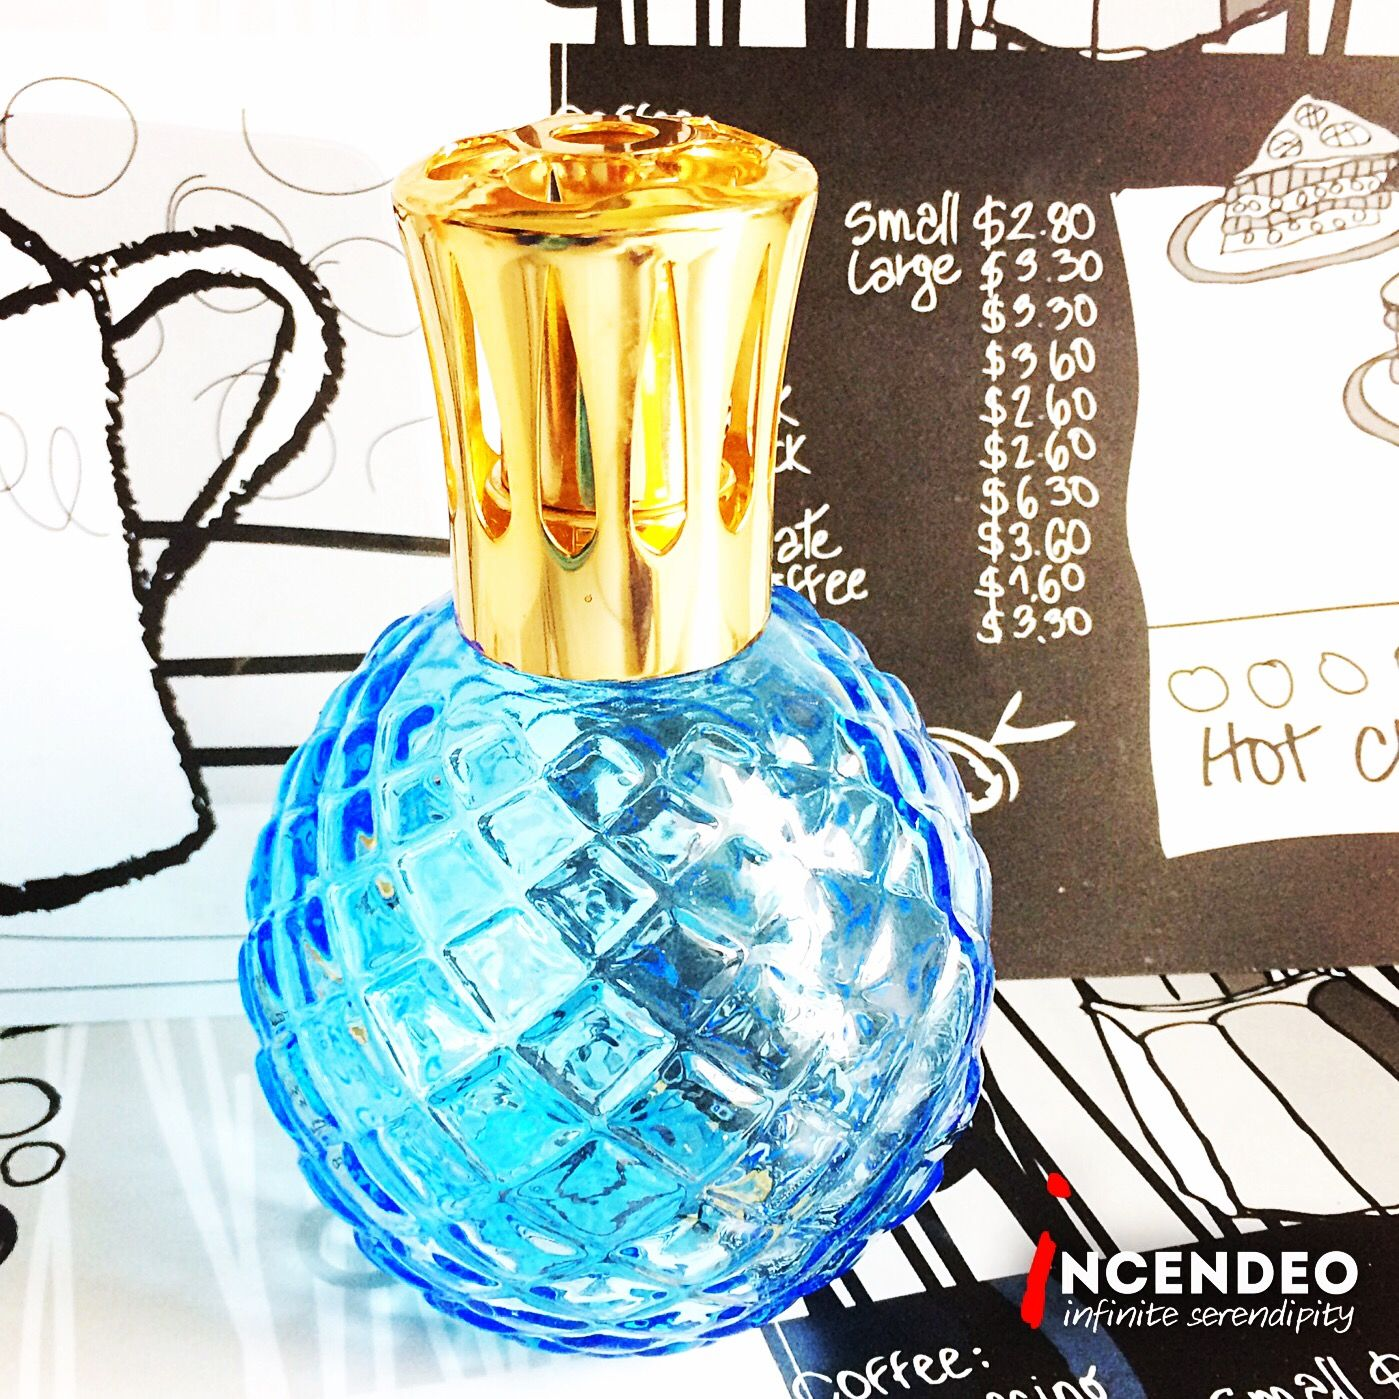 Lampe Berger Light Blue Pineapple Fragrance Diffuser Lampeberger Paris France Pineapple Fragrance Essentialoils Diffuser L Perfume Bottles Perfume Ale